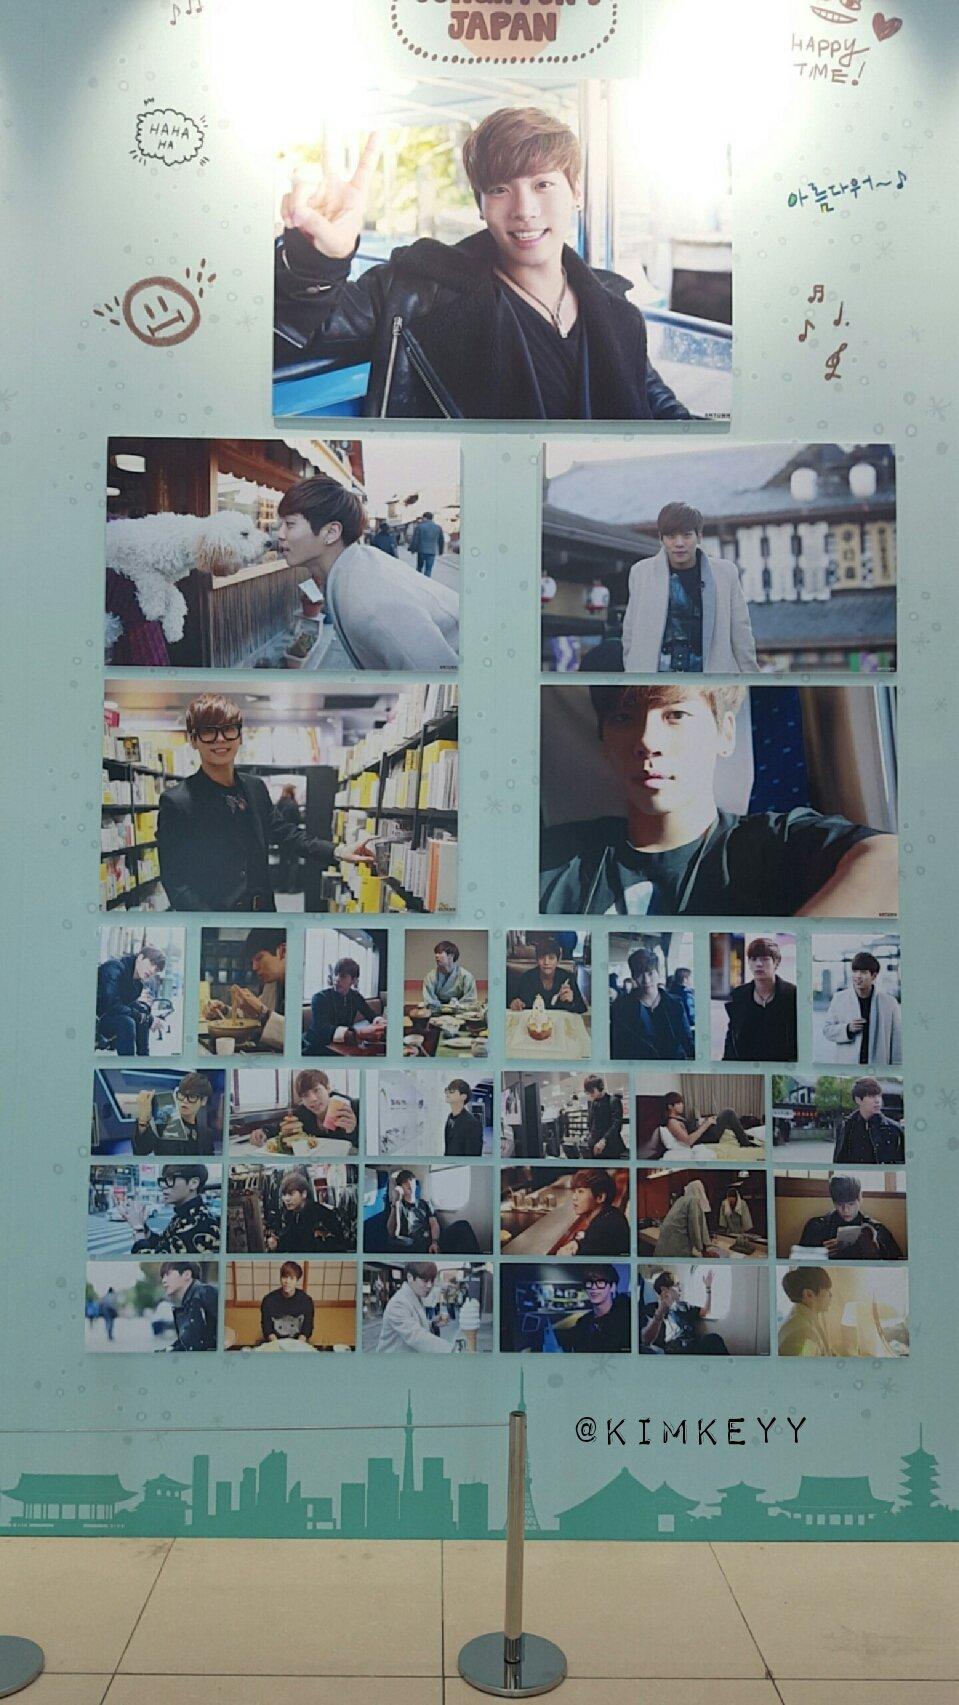 SHINee @ SHINee Surprise Vacation Exhibition 25310901585_5df808b8b3_o